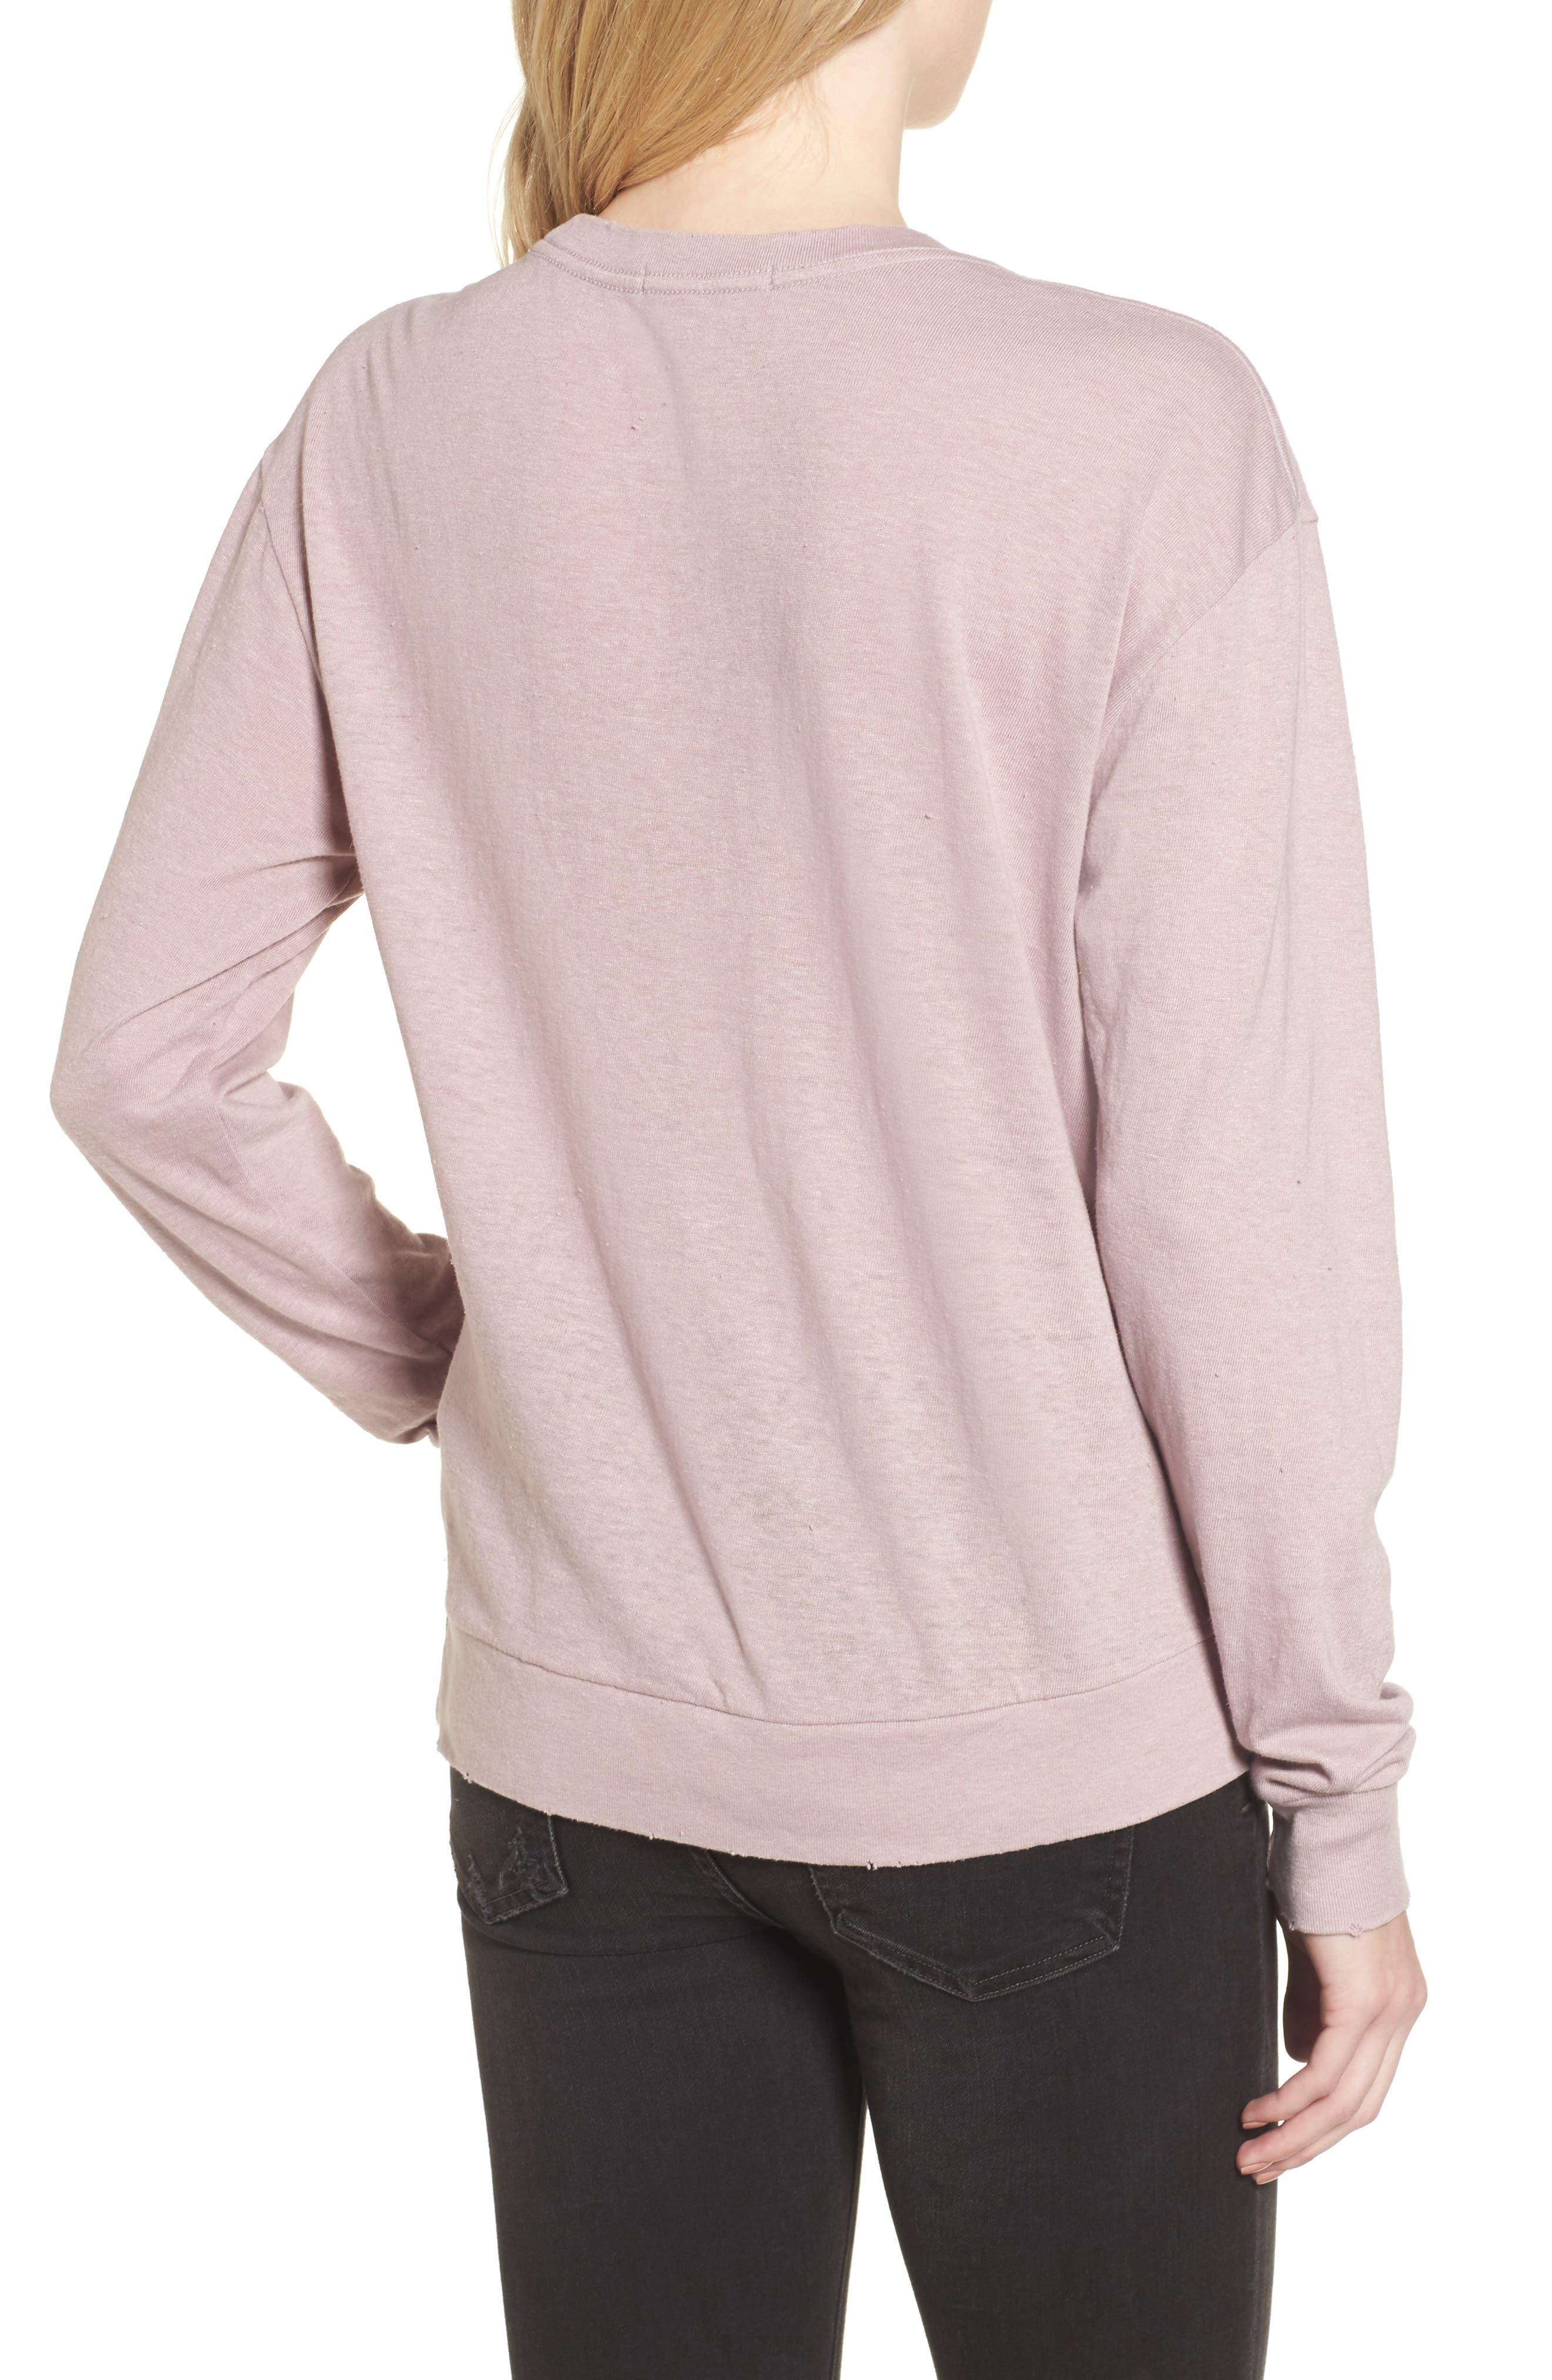 x Donald Robertson Black Dresses Sweatshirt,                             Alternate thumbnail 2, color,                             670